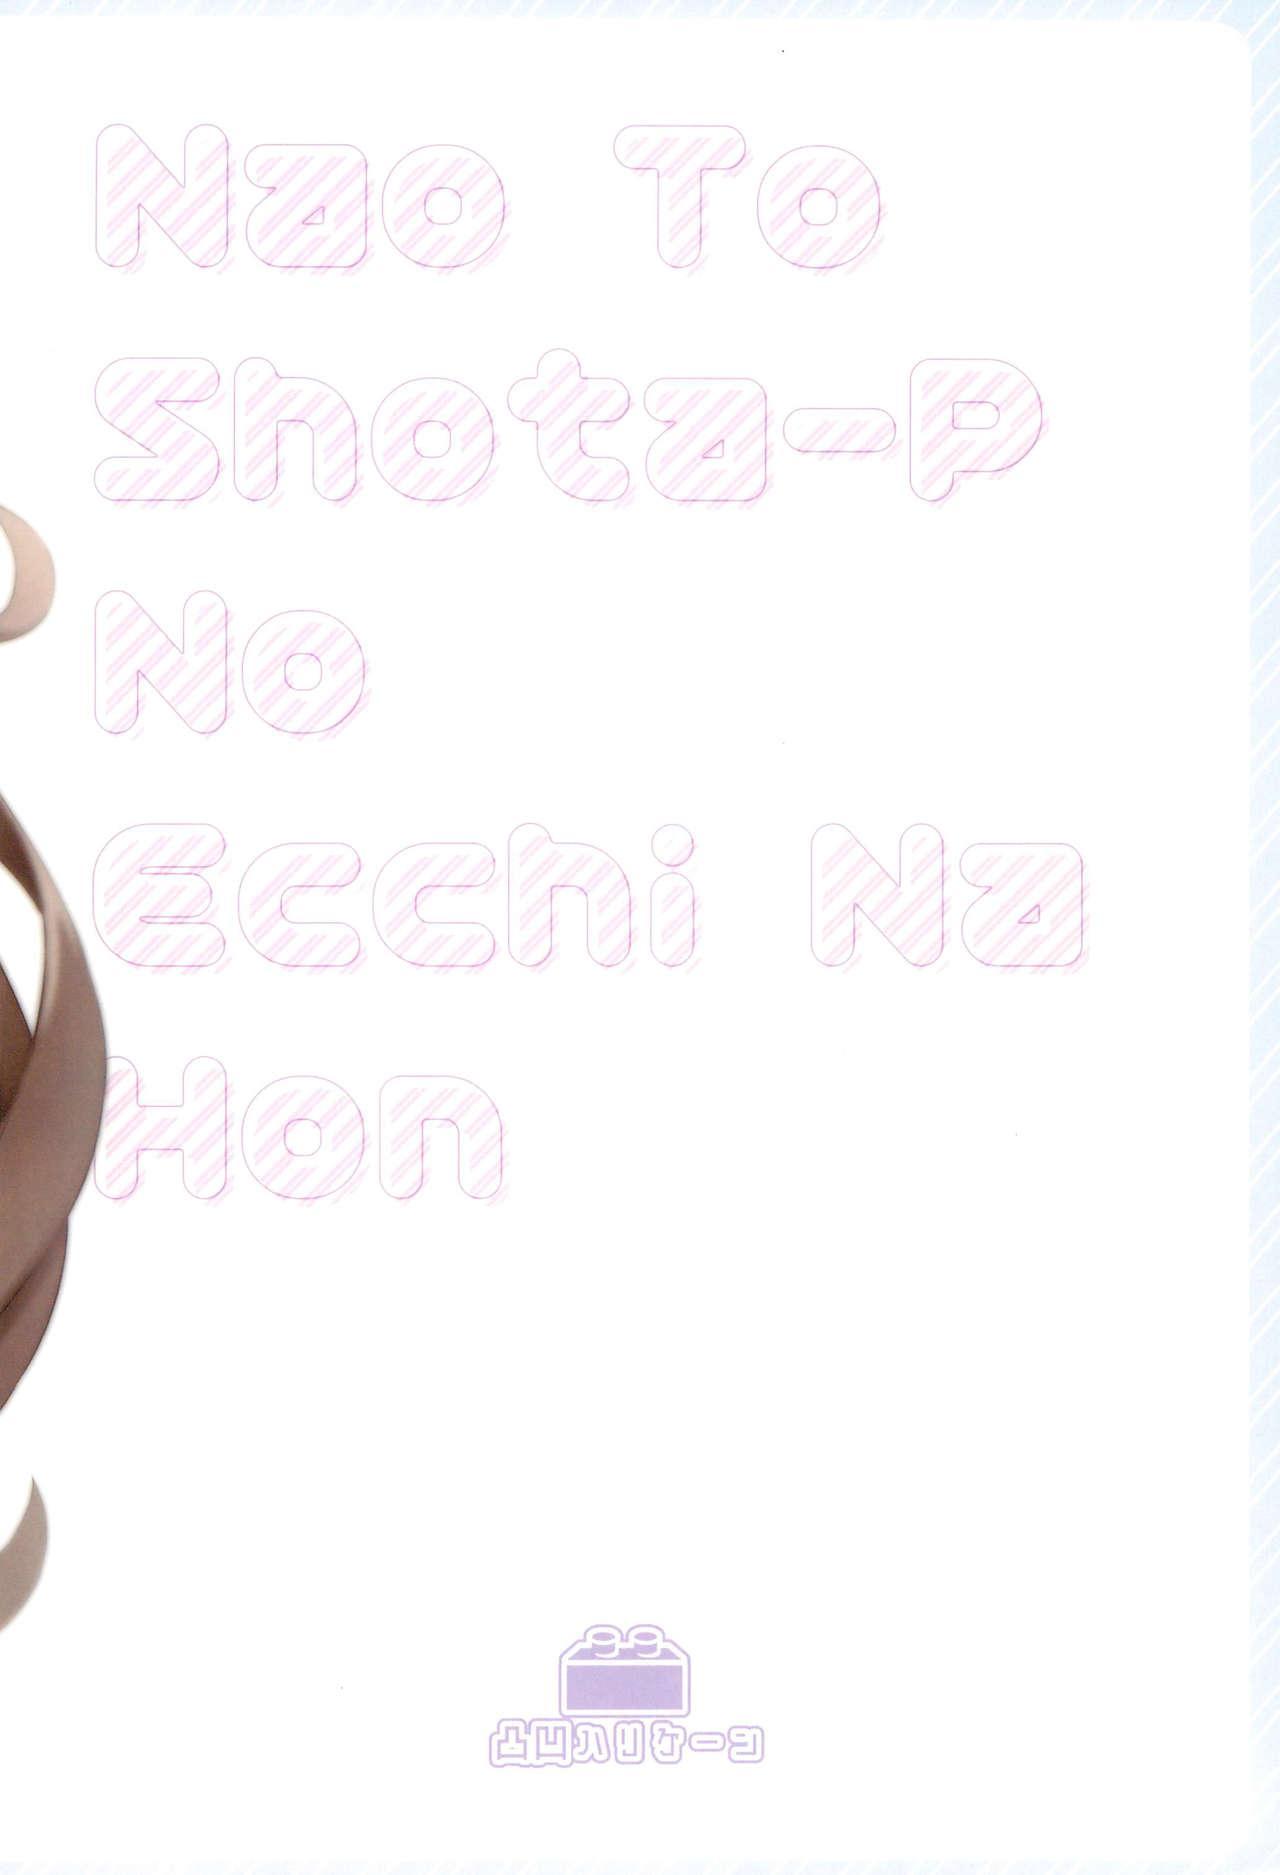 Nao to Shota P no Ecchi na Hon   Nao and Shota P's Eromanga 24